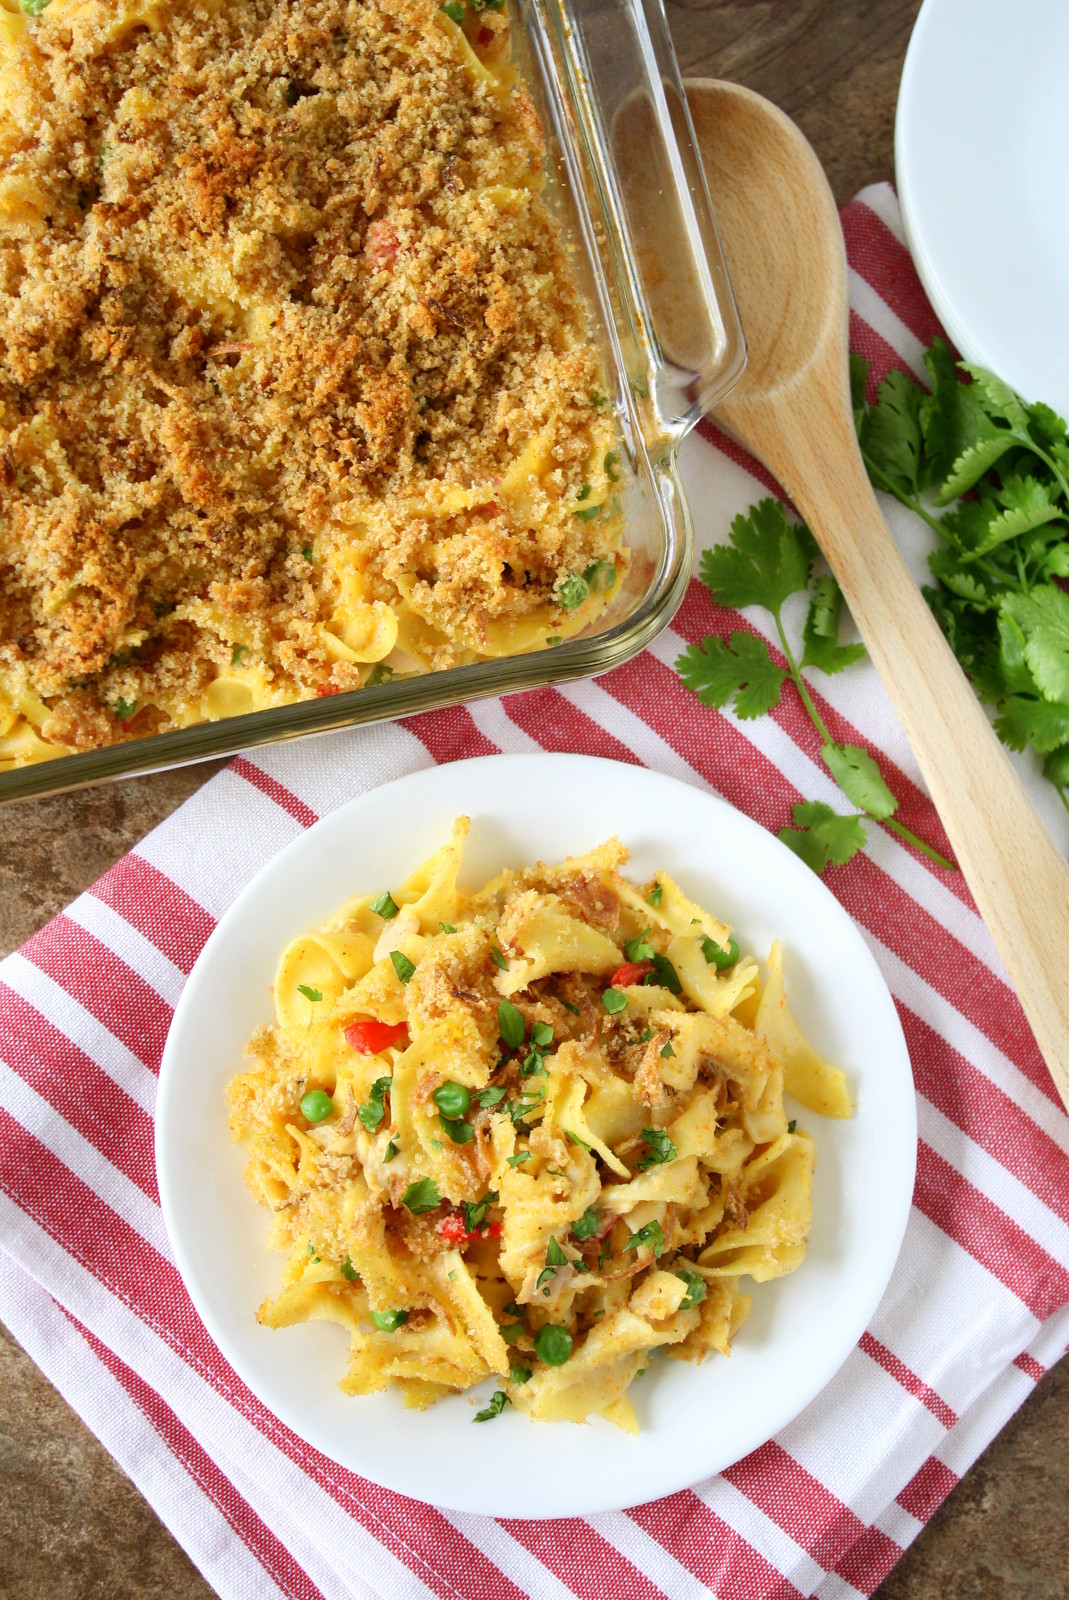 Egg Noodle Casserole Recipes Vegetarian  Dairy Free Tuna Noodle Casserole